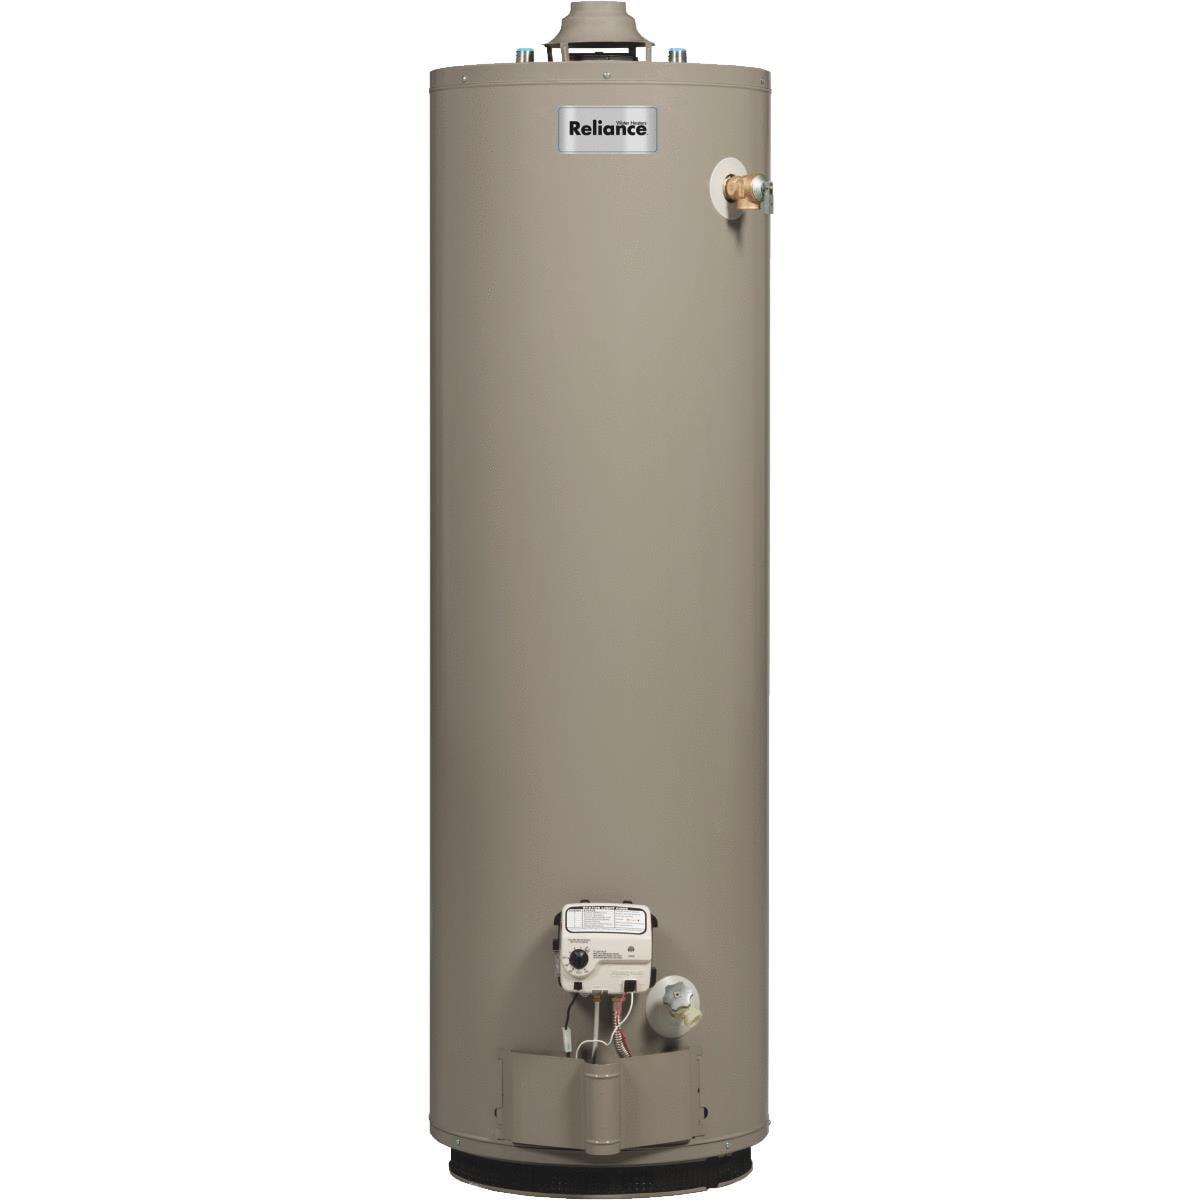 Reliance Liquid Propane (LP) Gas Water Heater